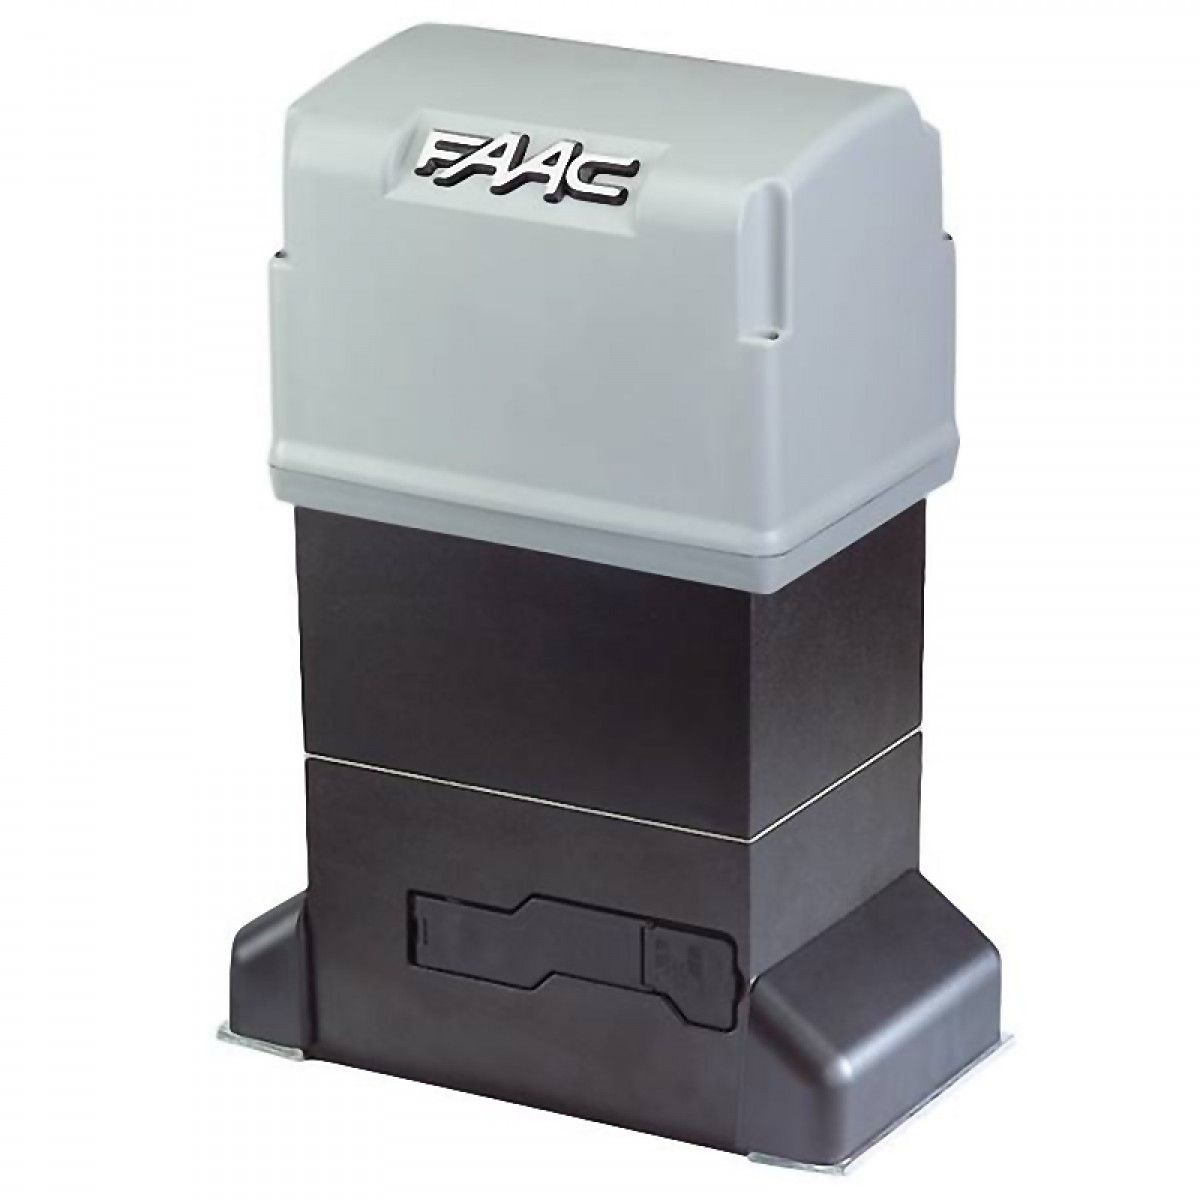 Faac Usa 844 10983711098372 Rack Pinion Slide Gate Operator